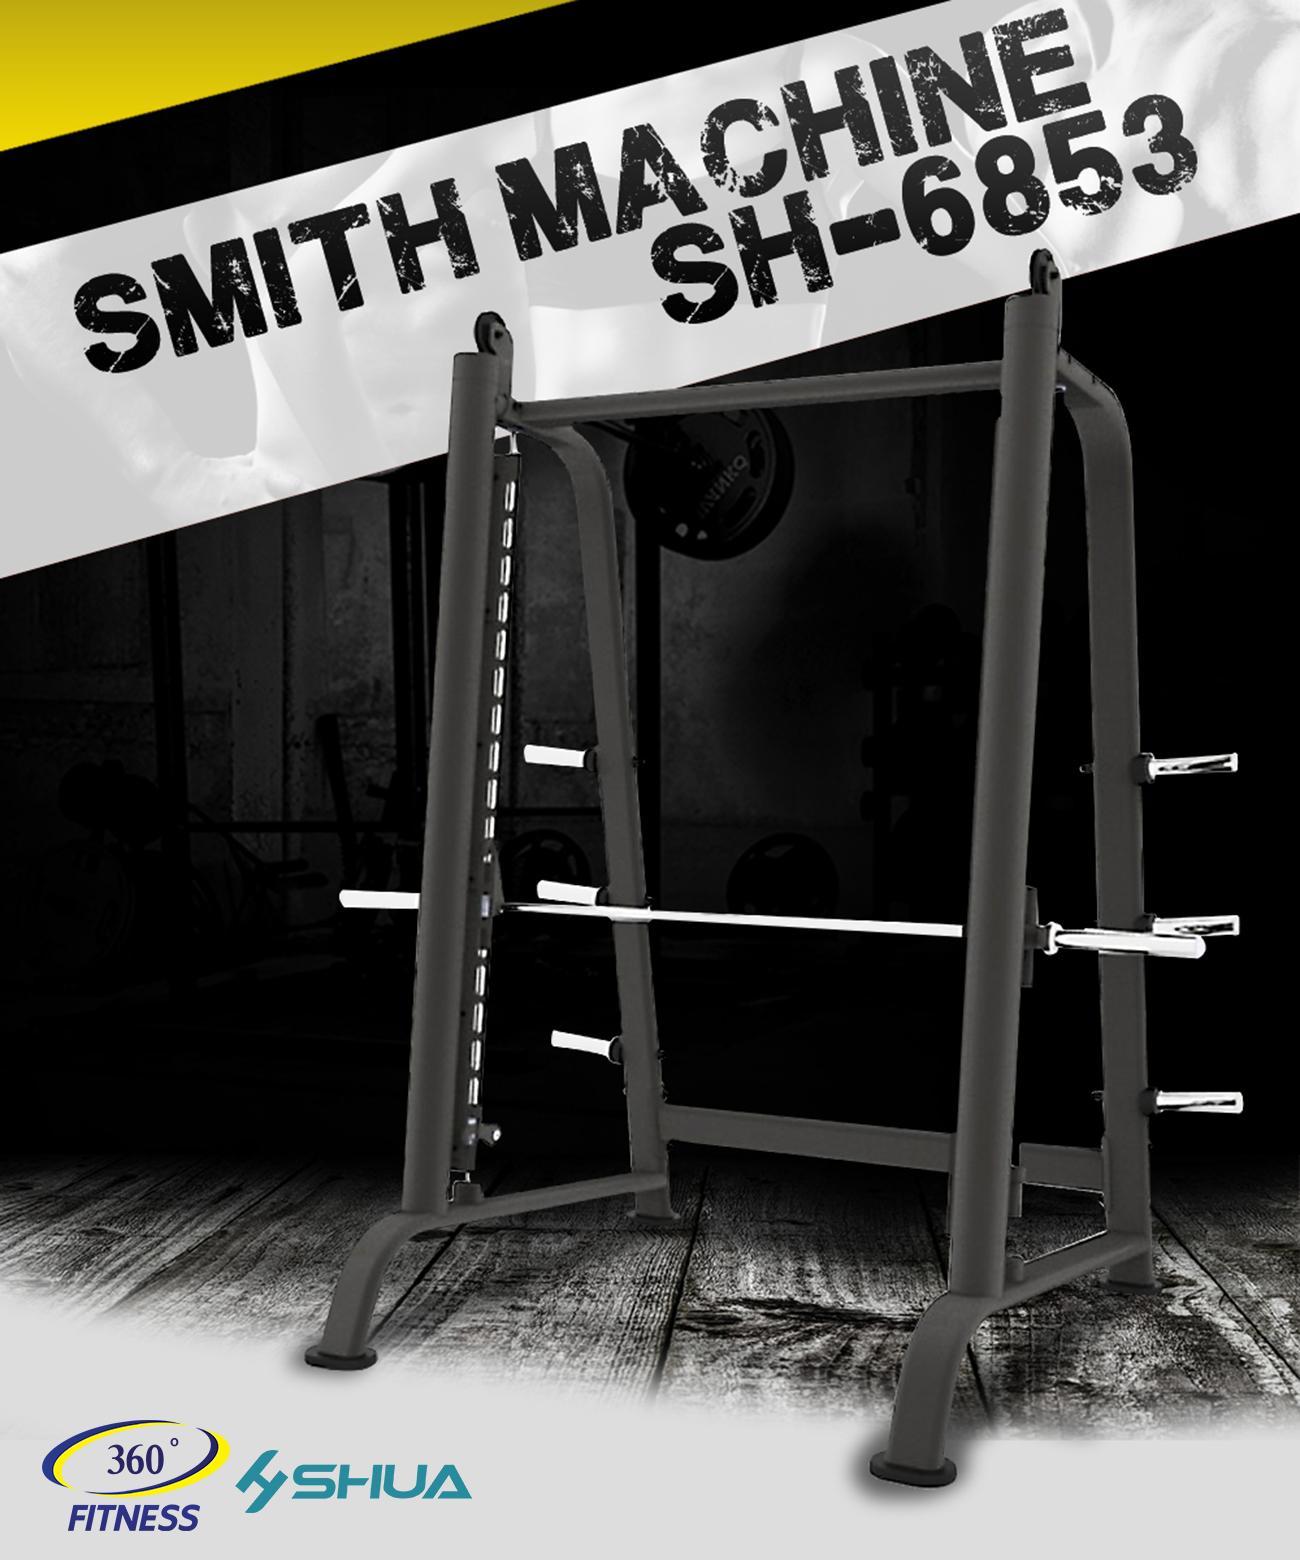 Smith Machine (SH-6853)